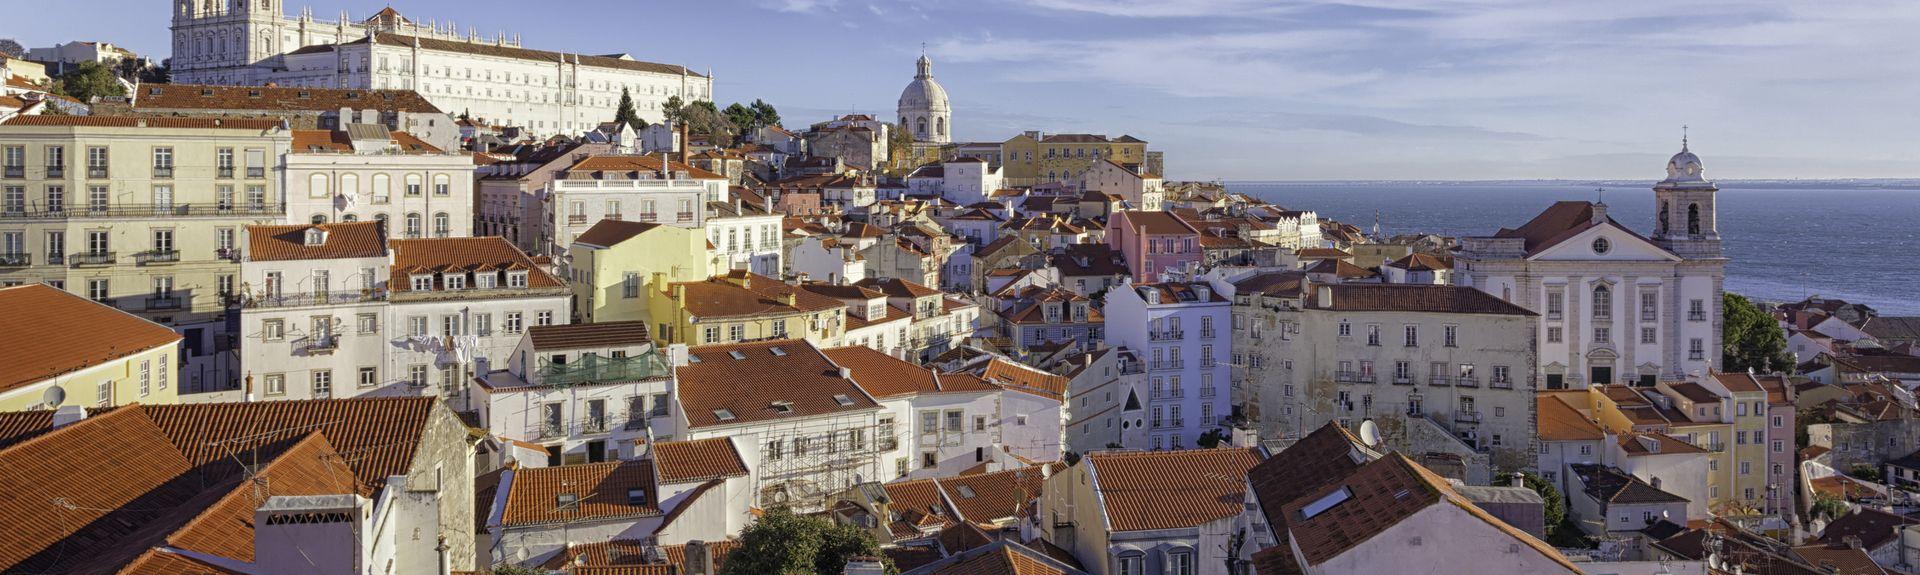 Alfama, Lissabon, Distrito de Lisboa, Portugal